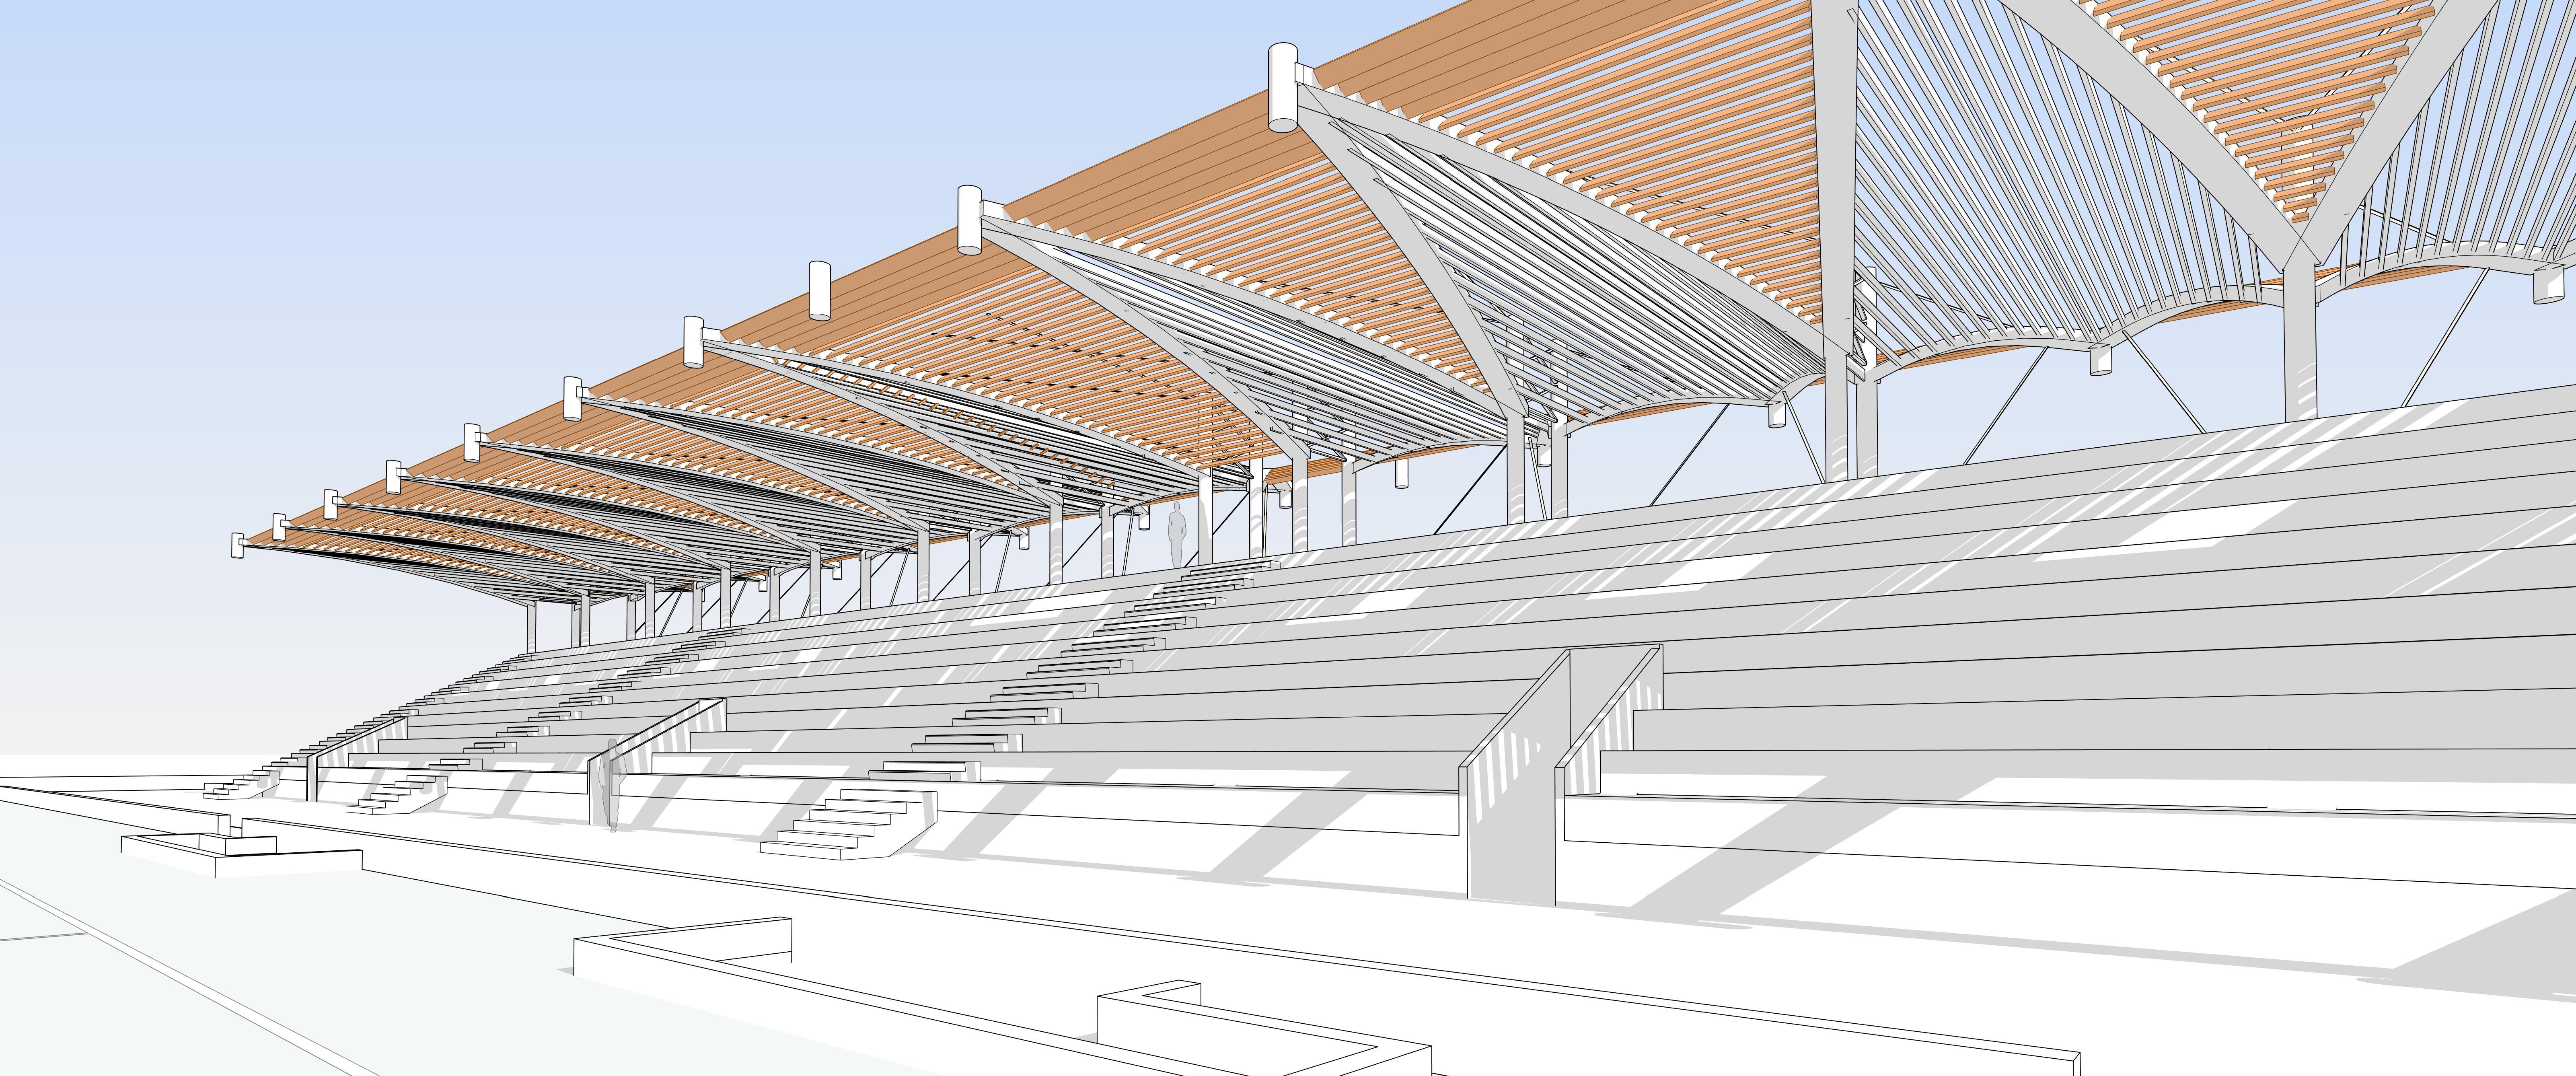 RL_אצטדיון OP4 - 3D View - מבט נמוך.jpg